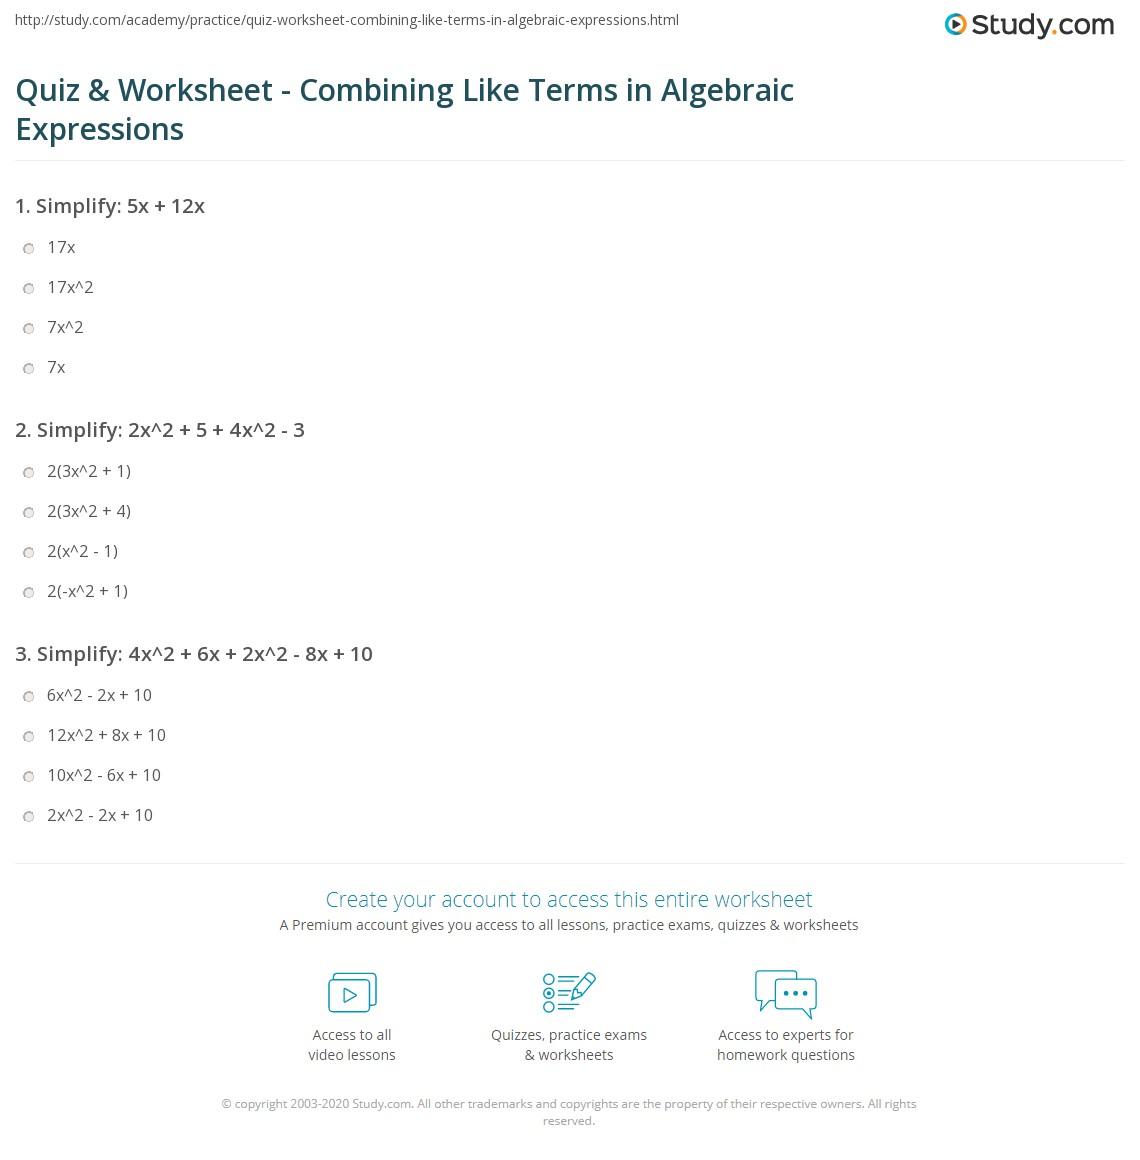 Quiz W Ksheet B G Like Terms Lgebr Ic Expressi S